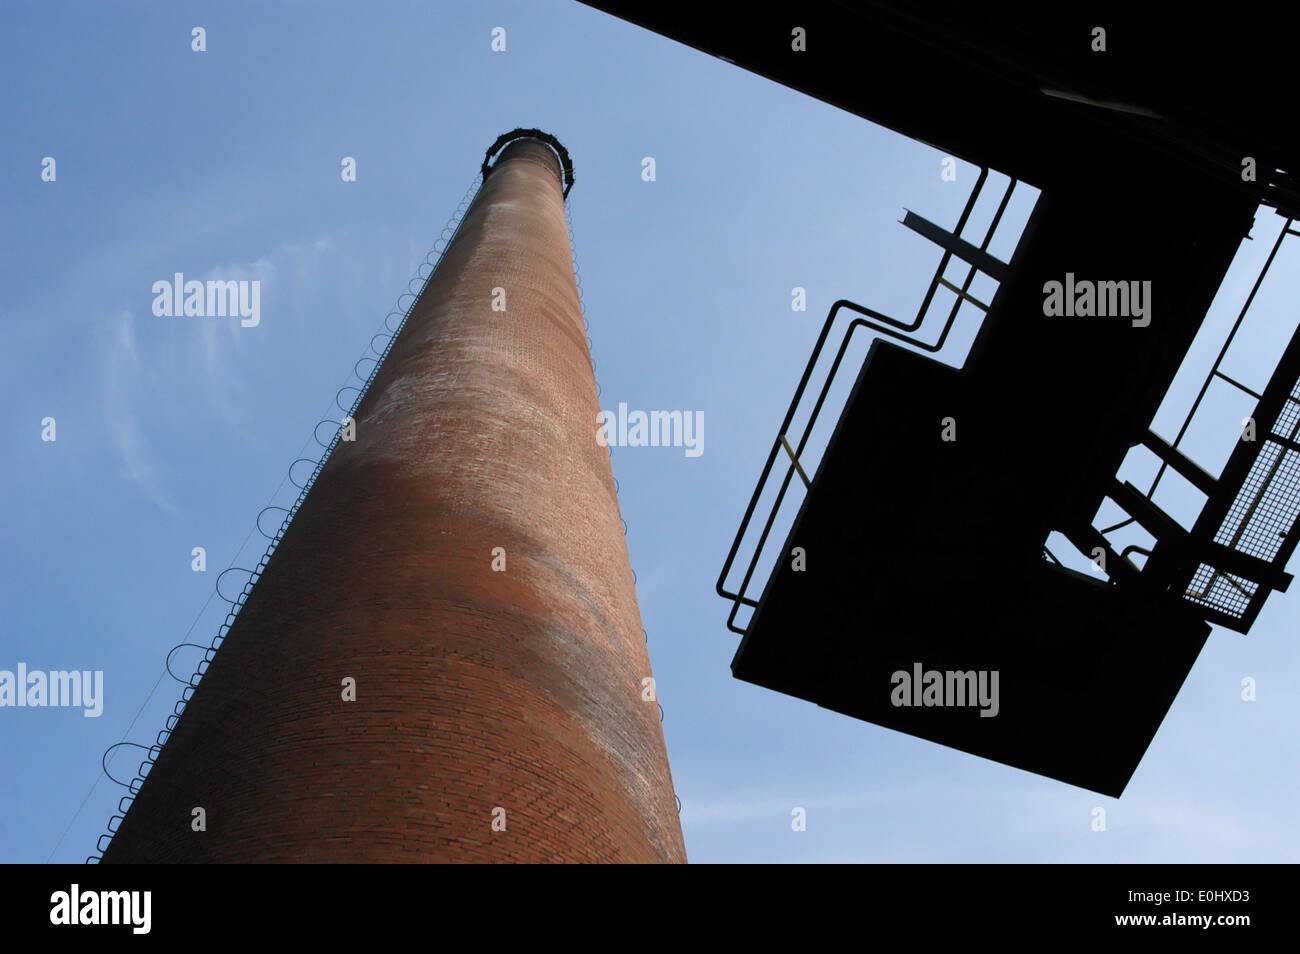 Deutschland, Essen, Zeche Zollverein, UNESCO Welterbe, Germany, Essen, Zeche Zollverein Coal Mine Industrial Complex - Stock Image